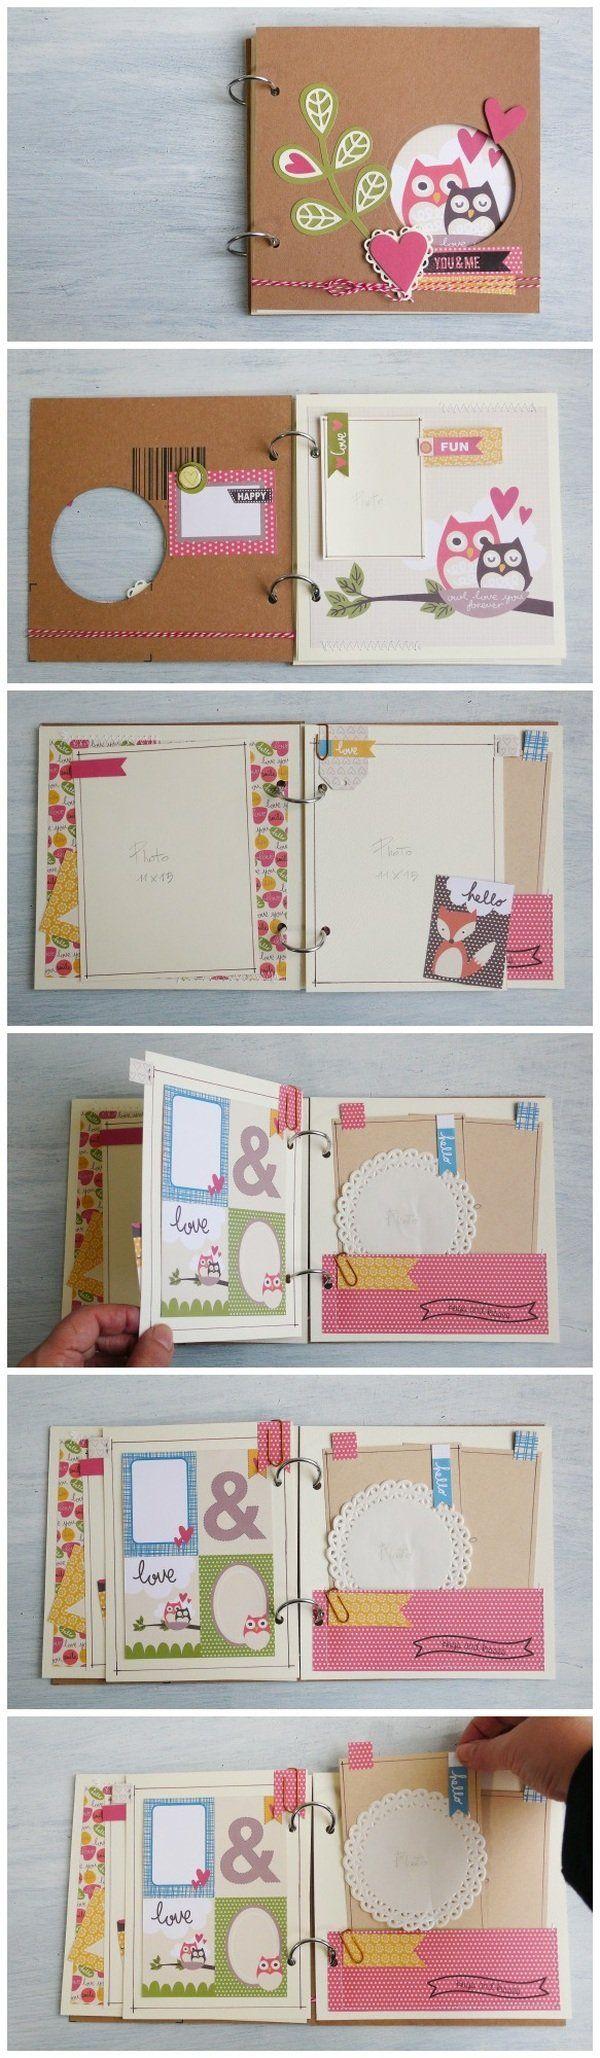 Scrapbook ideas china - Scrapbooking Mini Album Love Sizzix Big Shot Plus